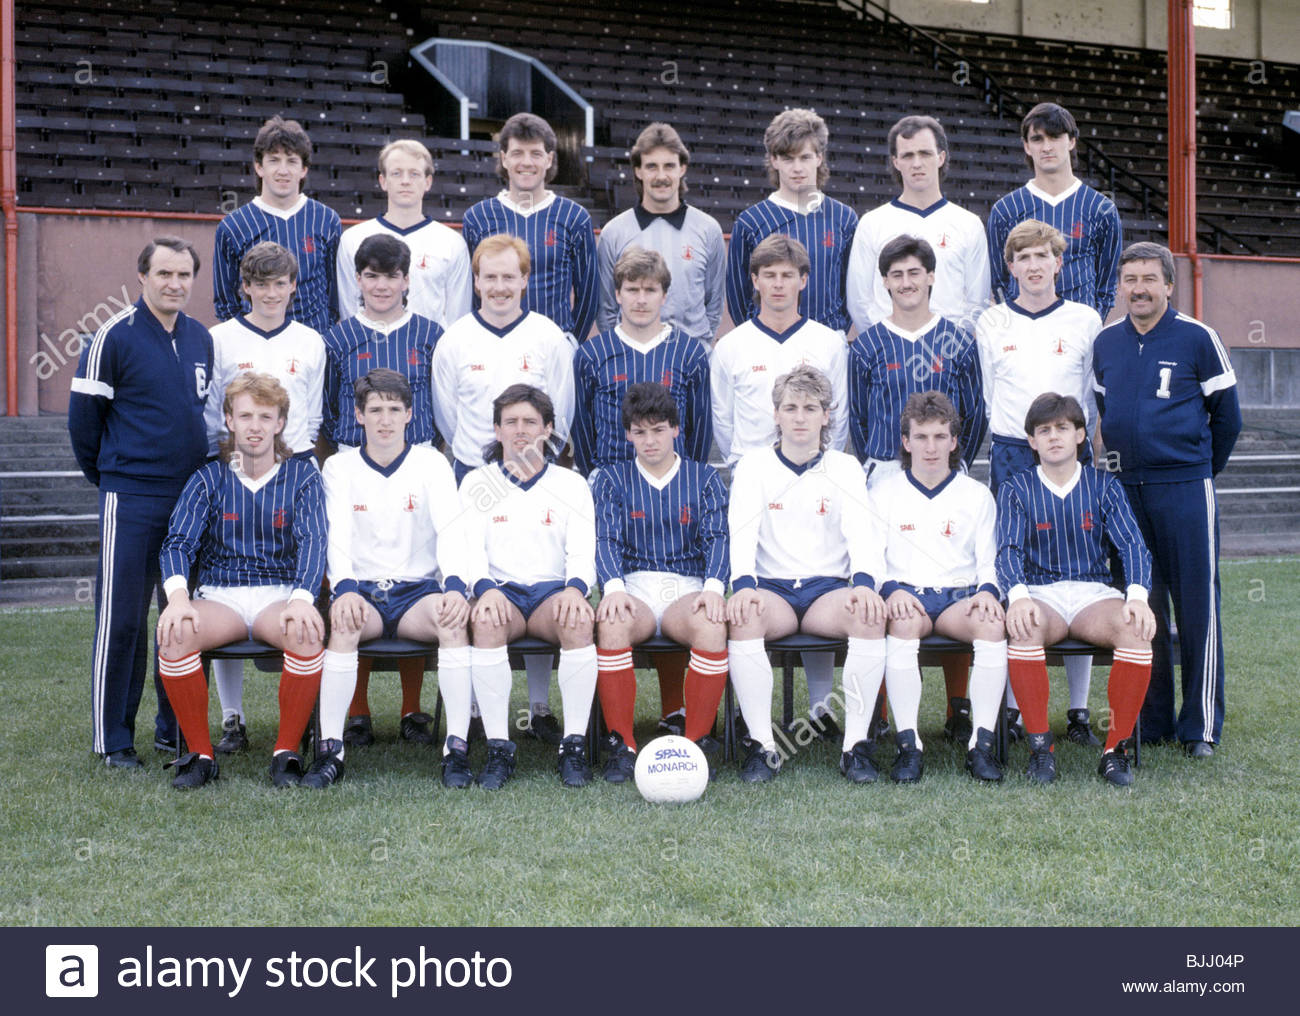 SEASON 1985/1986 FALKIRK Falkirk team picture - Stock Image